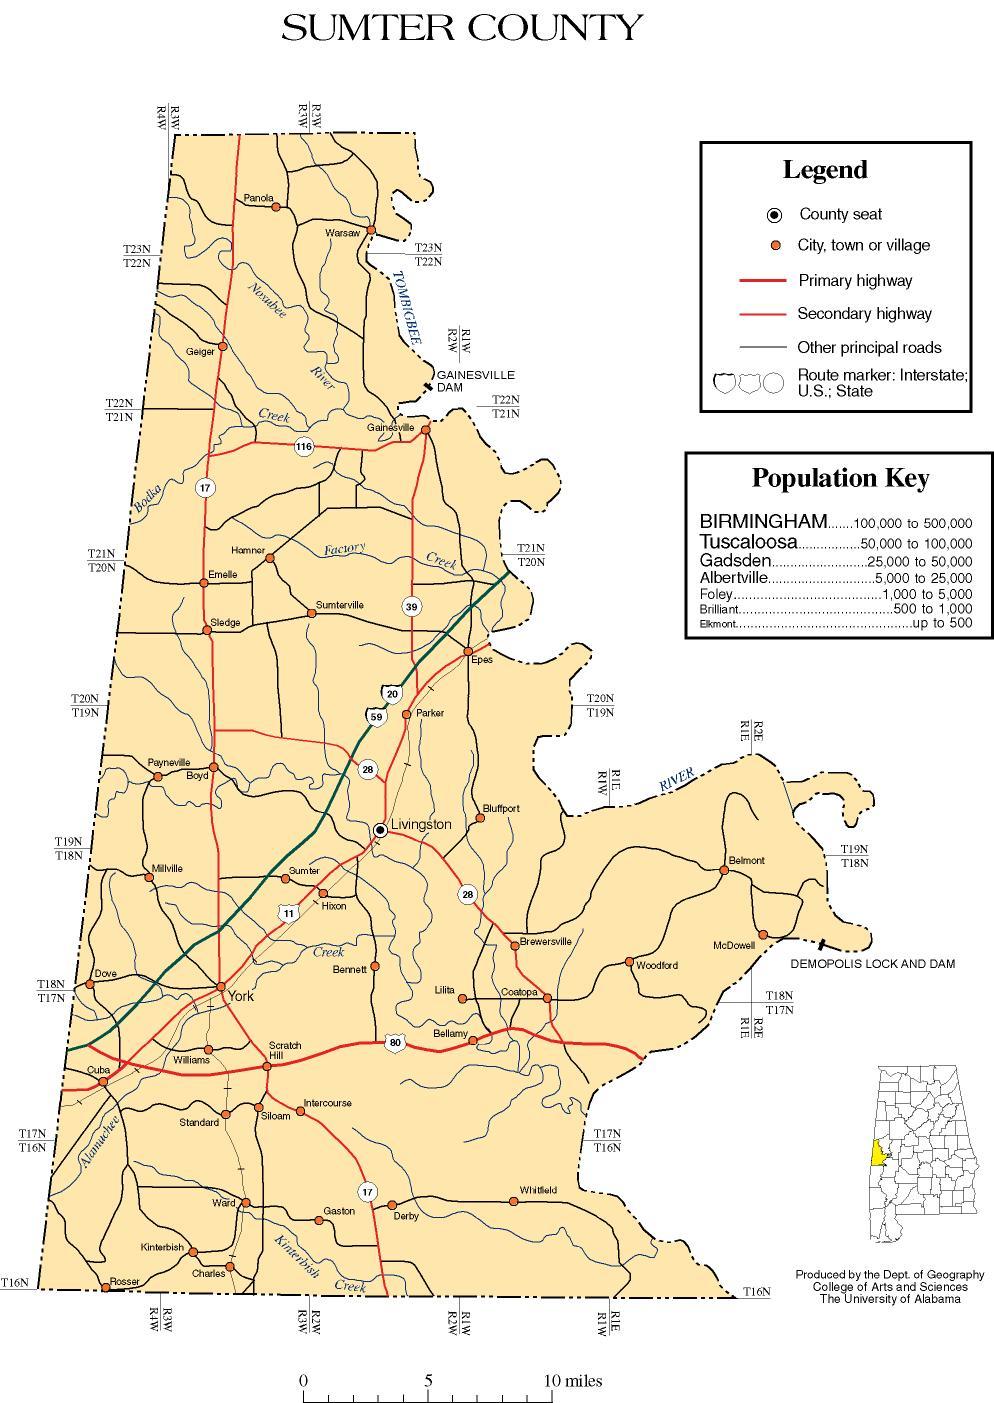 Sumter County, Alabama history, ADAH